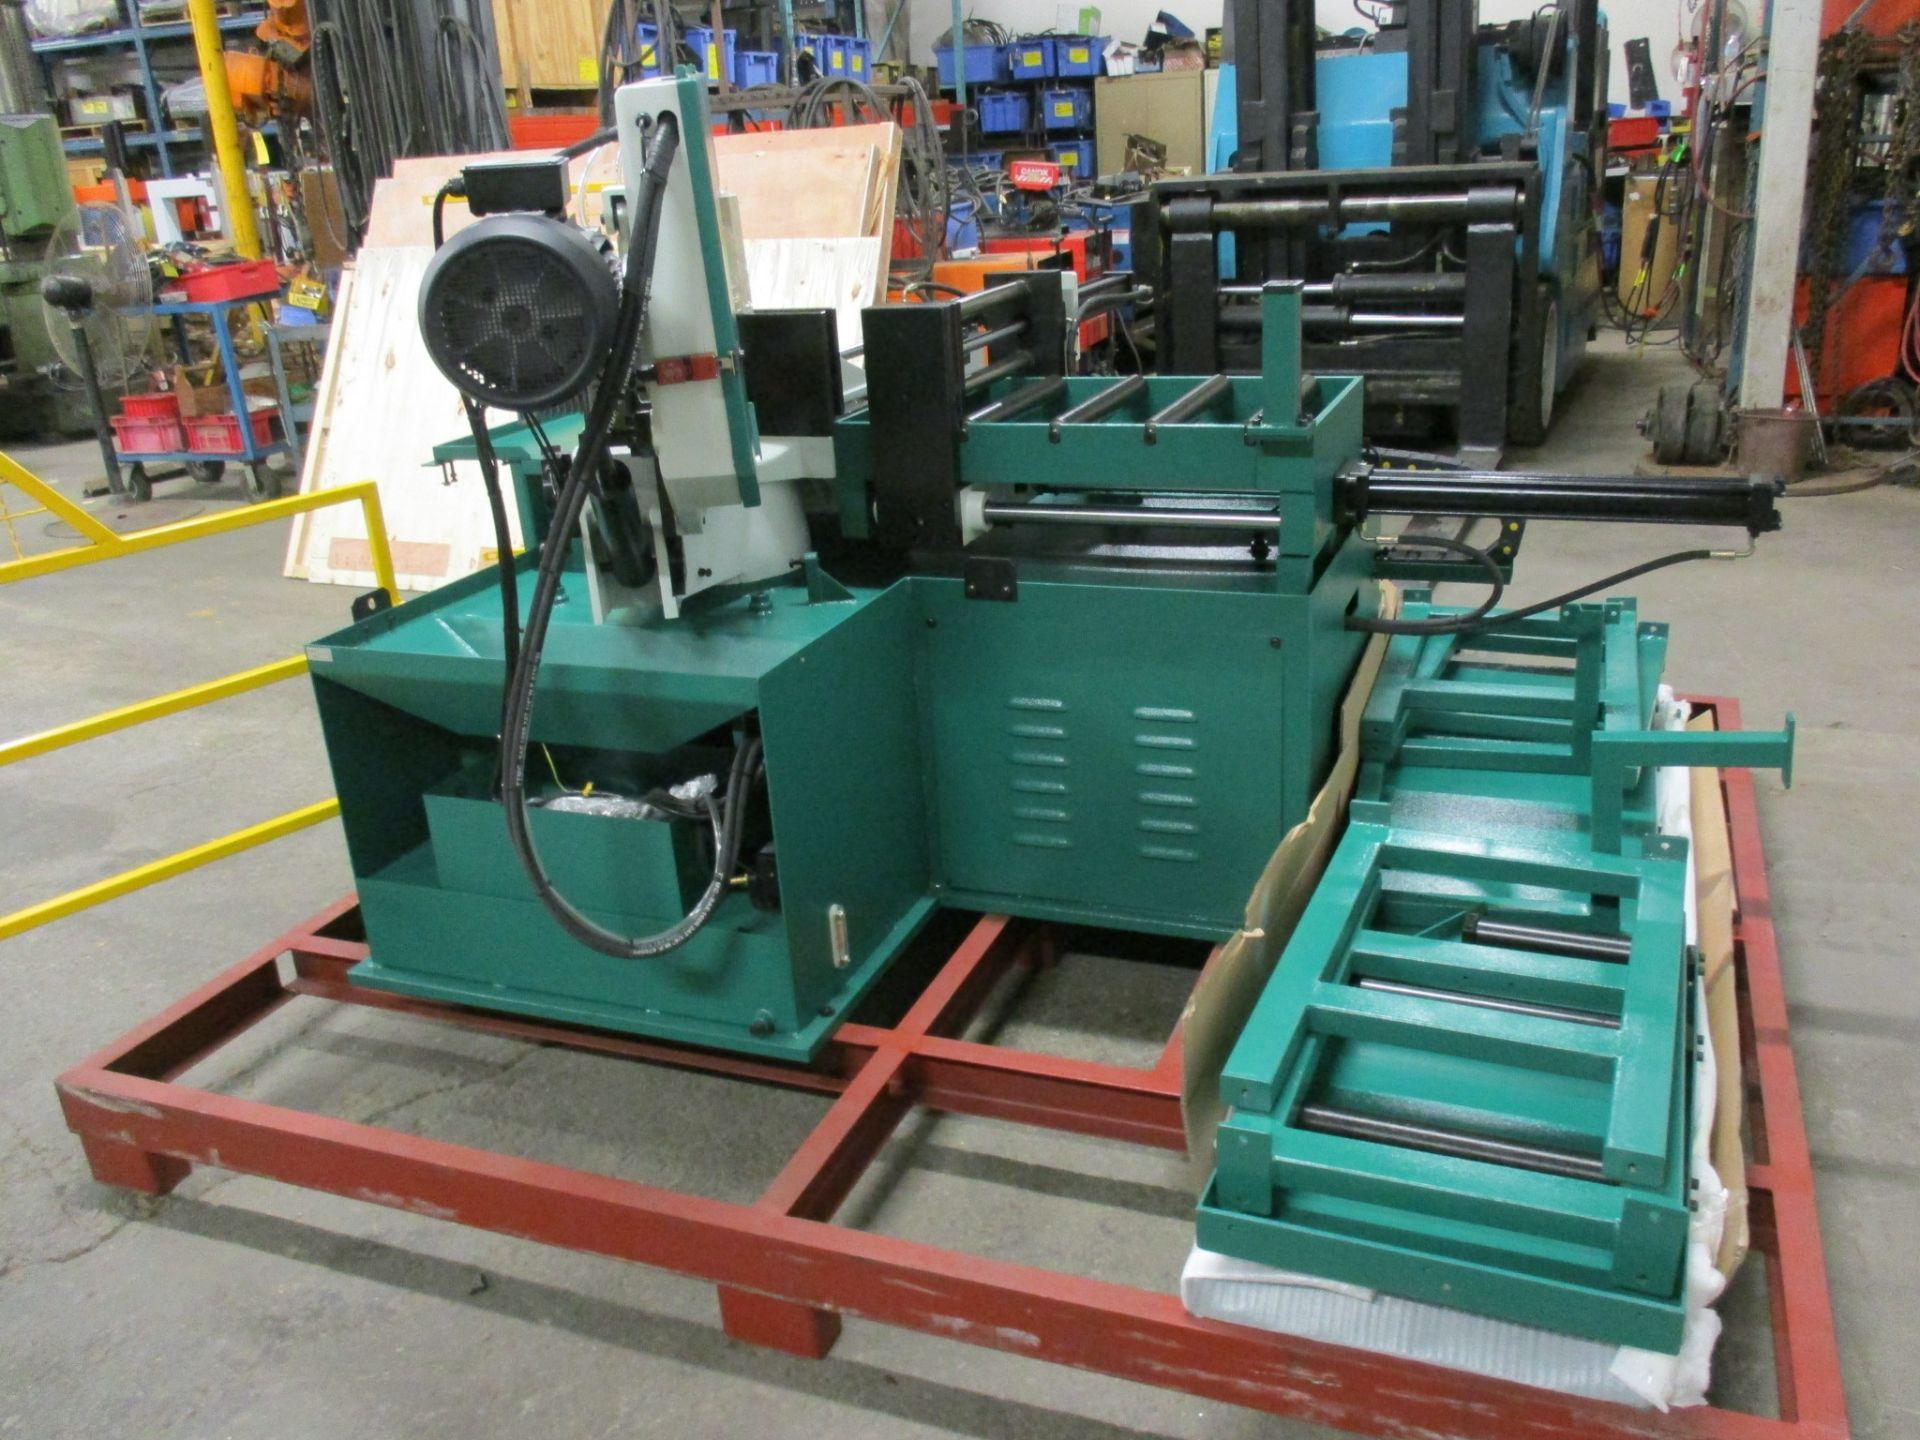 Lot 239 - Magnum BSM-1813A Fully Automatic CNC Horizontal Band Saw - 18 X 13 inch CUTTING CAPACITY - CNC